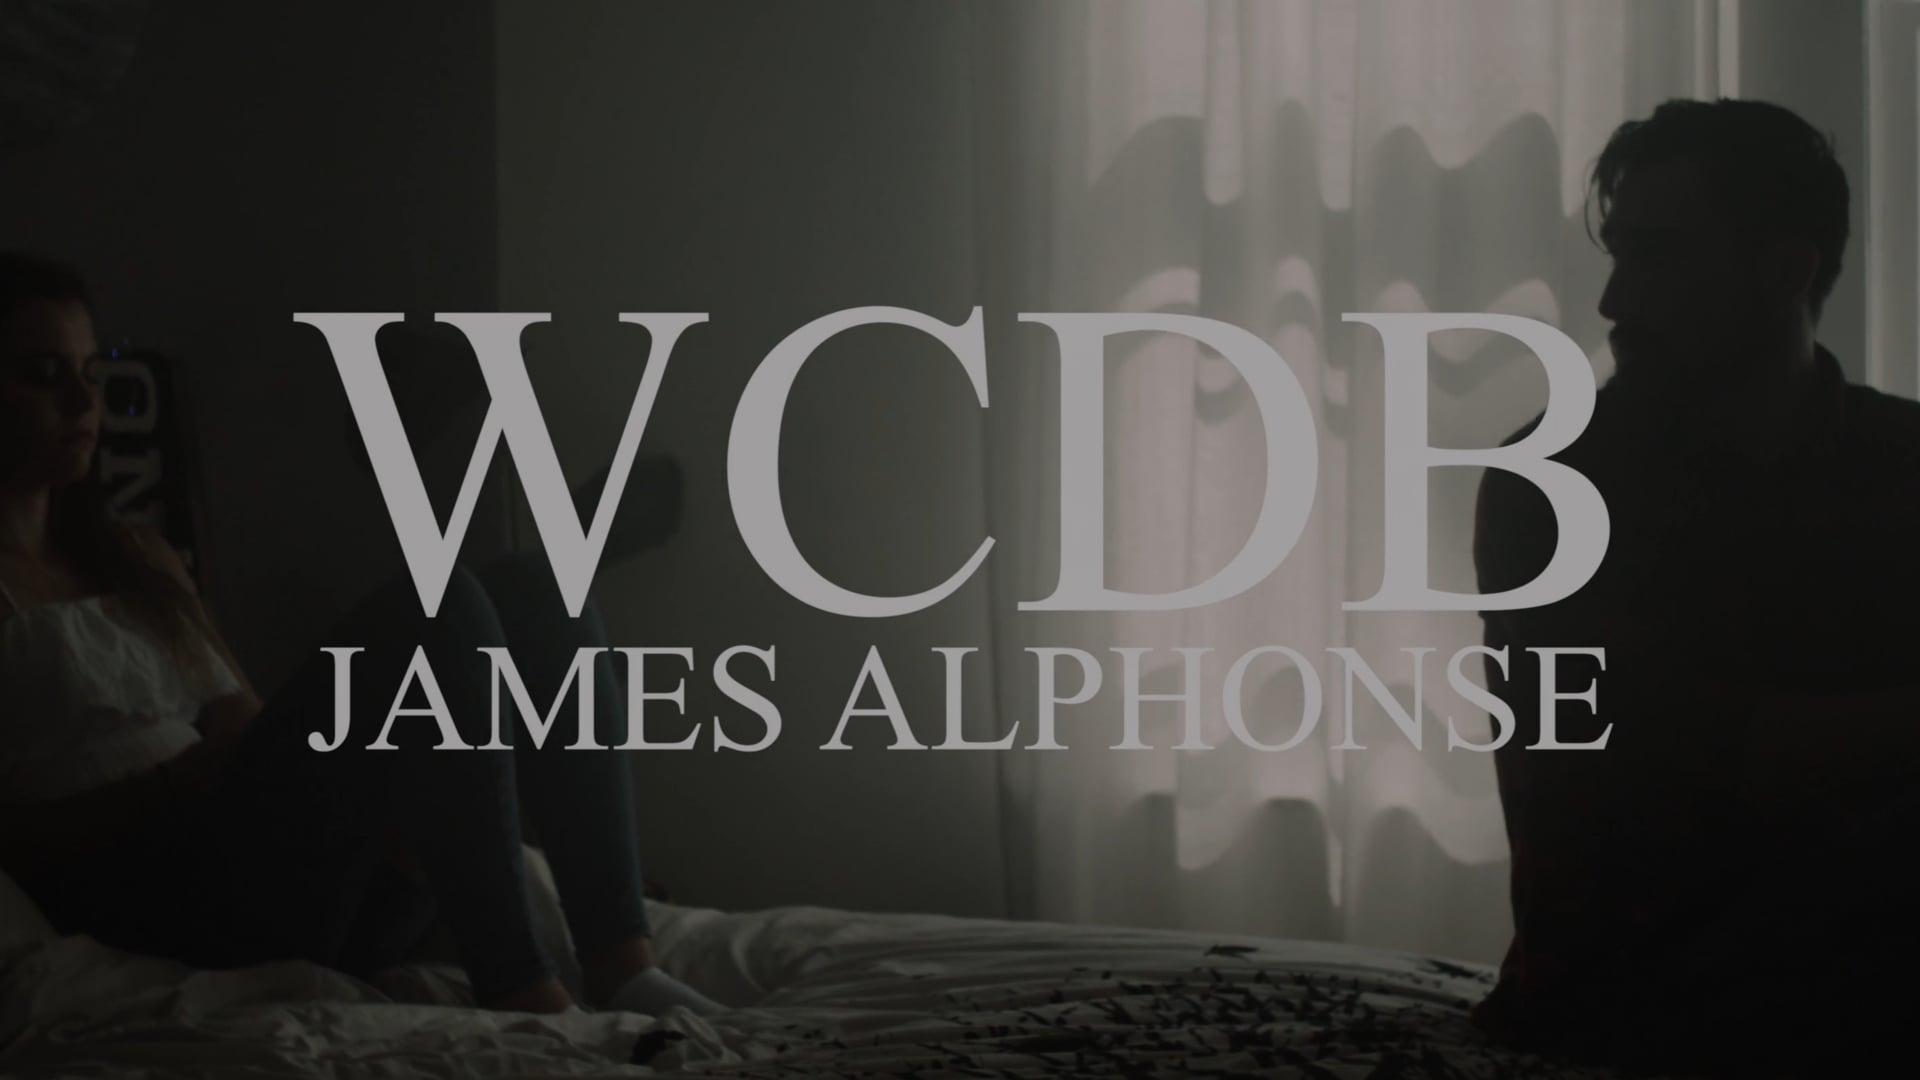 James Alphonse - WCDB (Music Video) [Director's Cut]